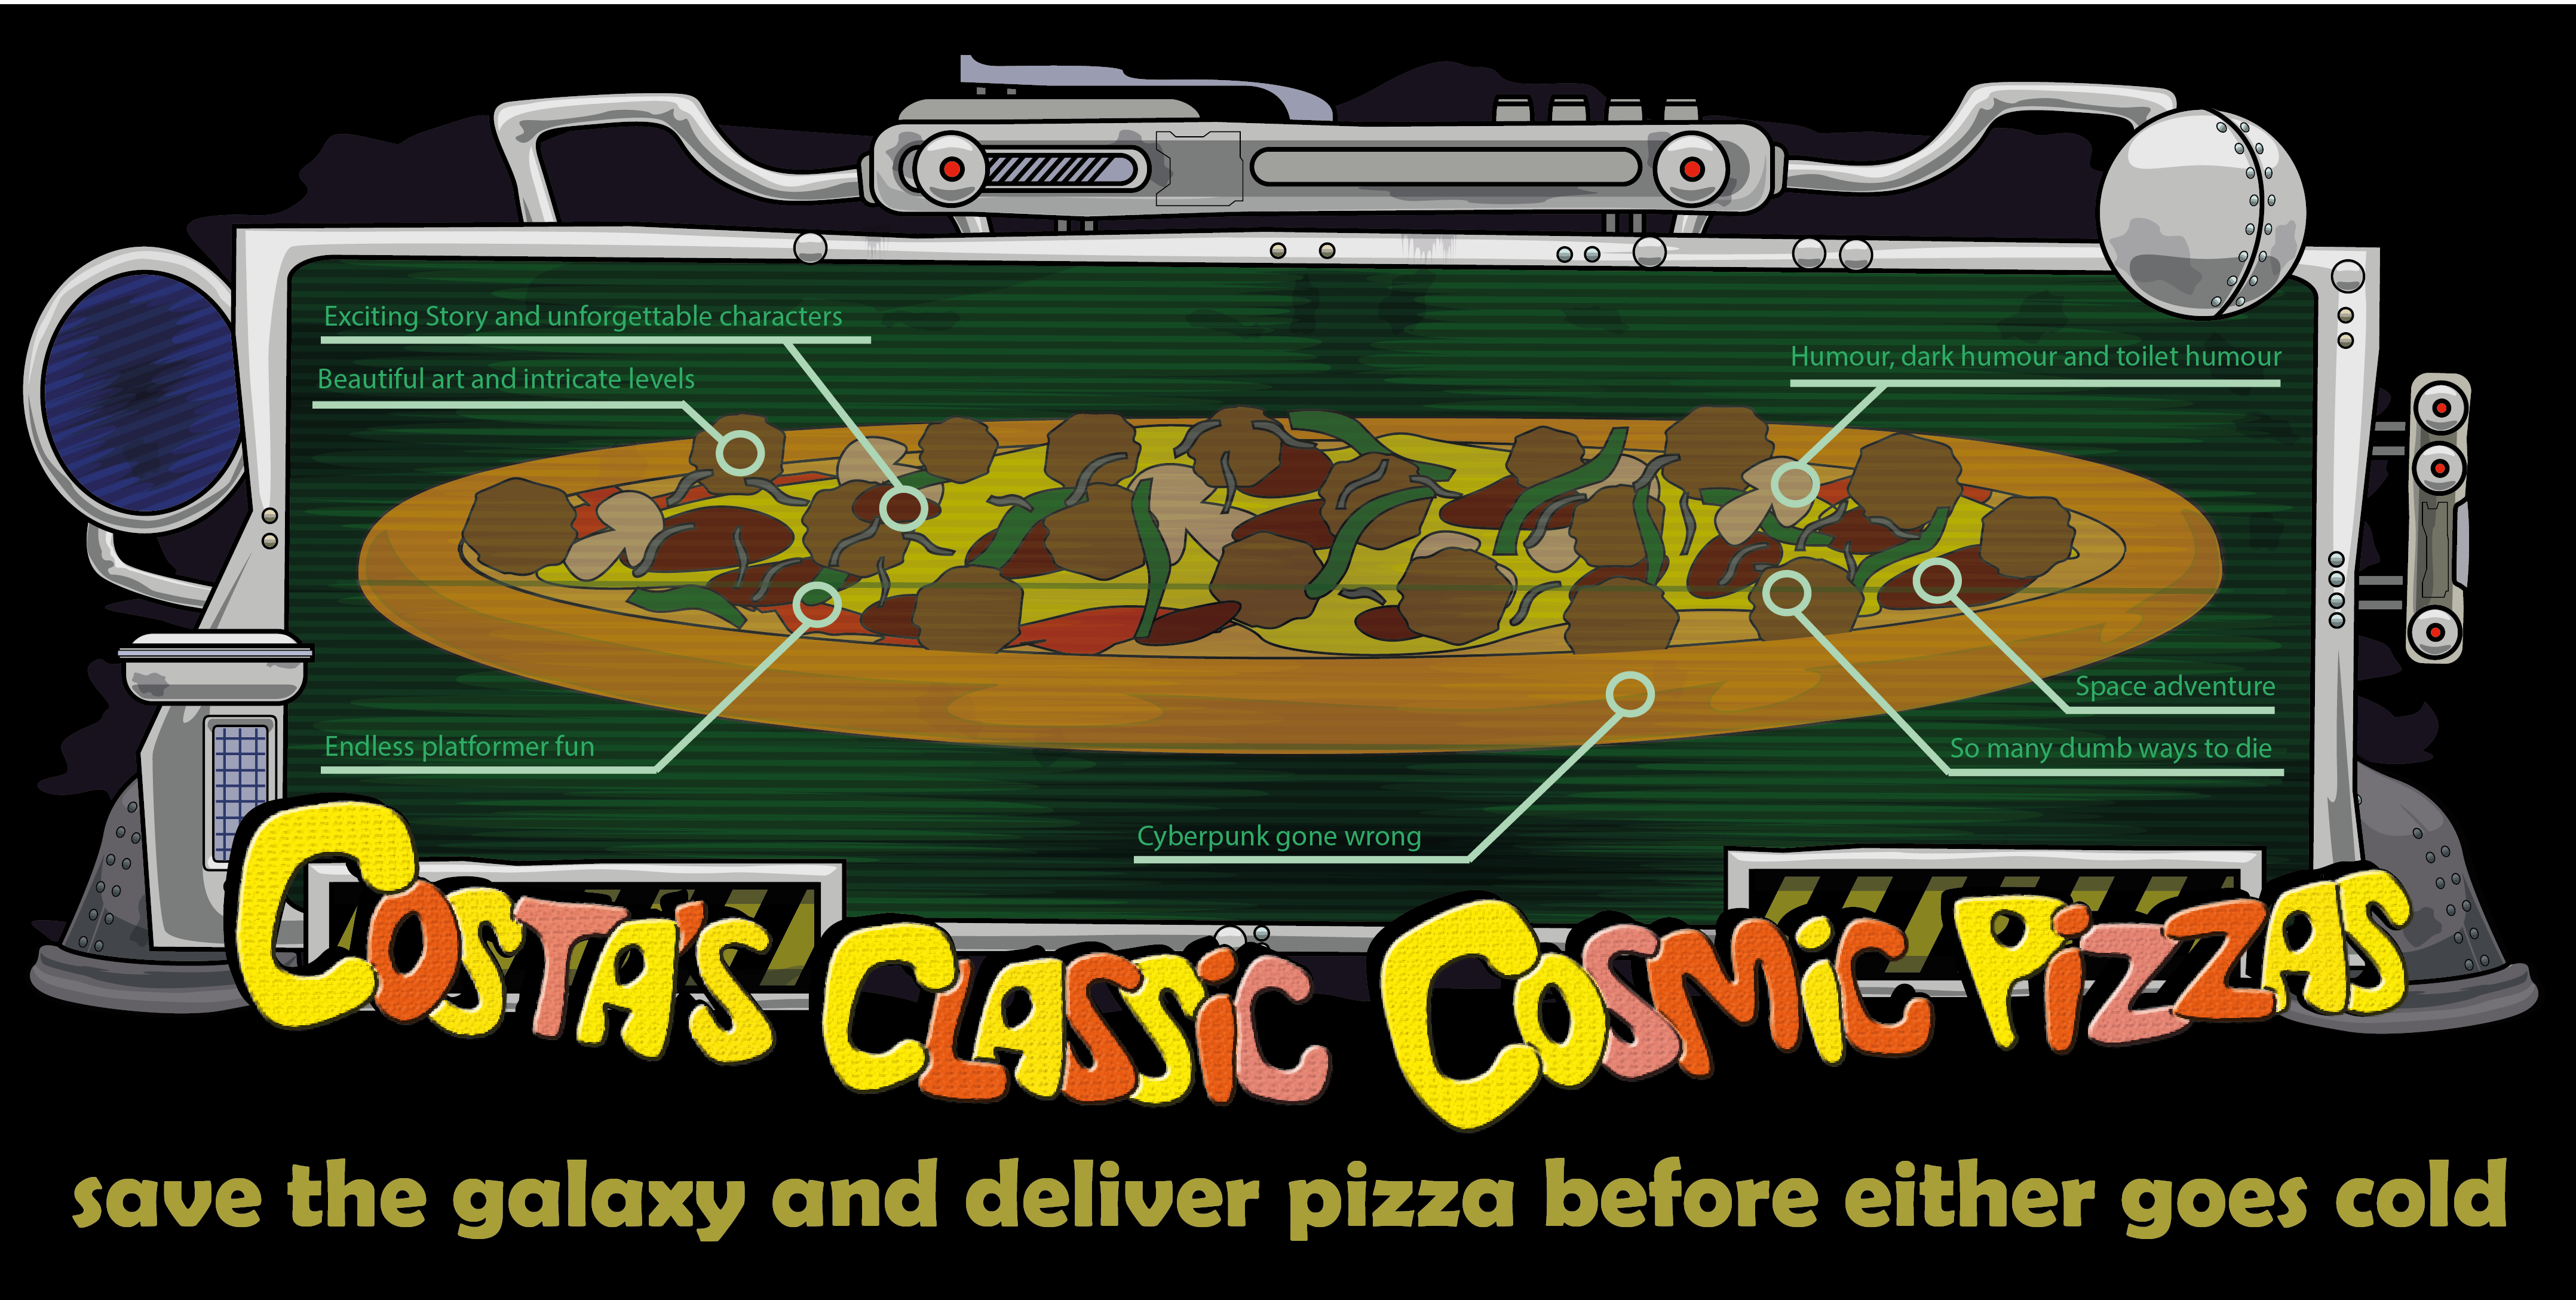 Costa's Classic Cosmic Pizzas